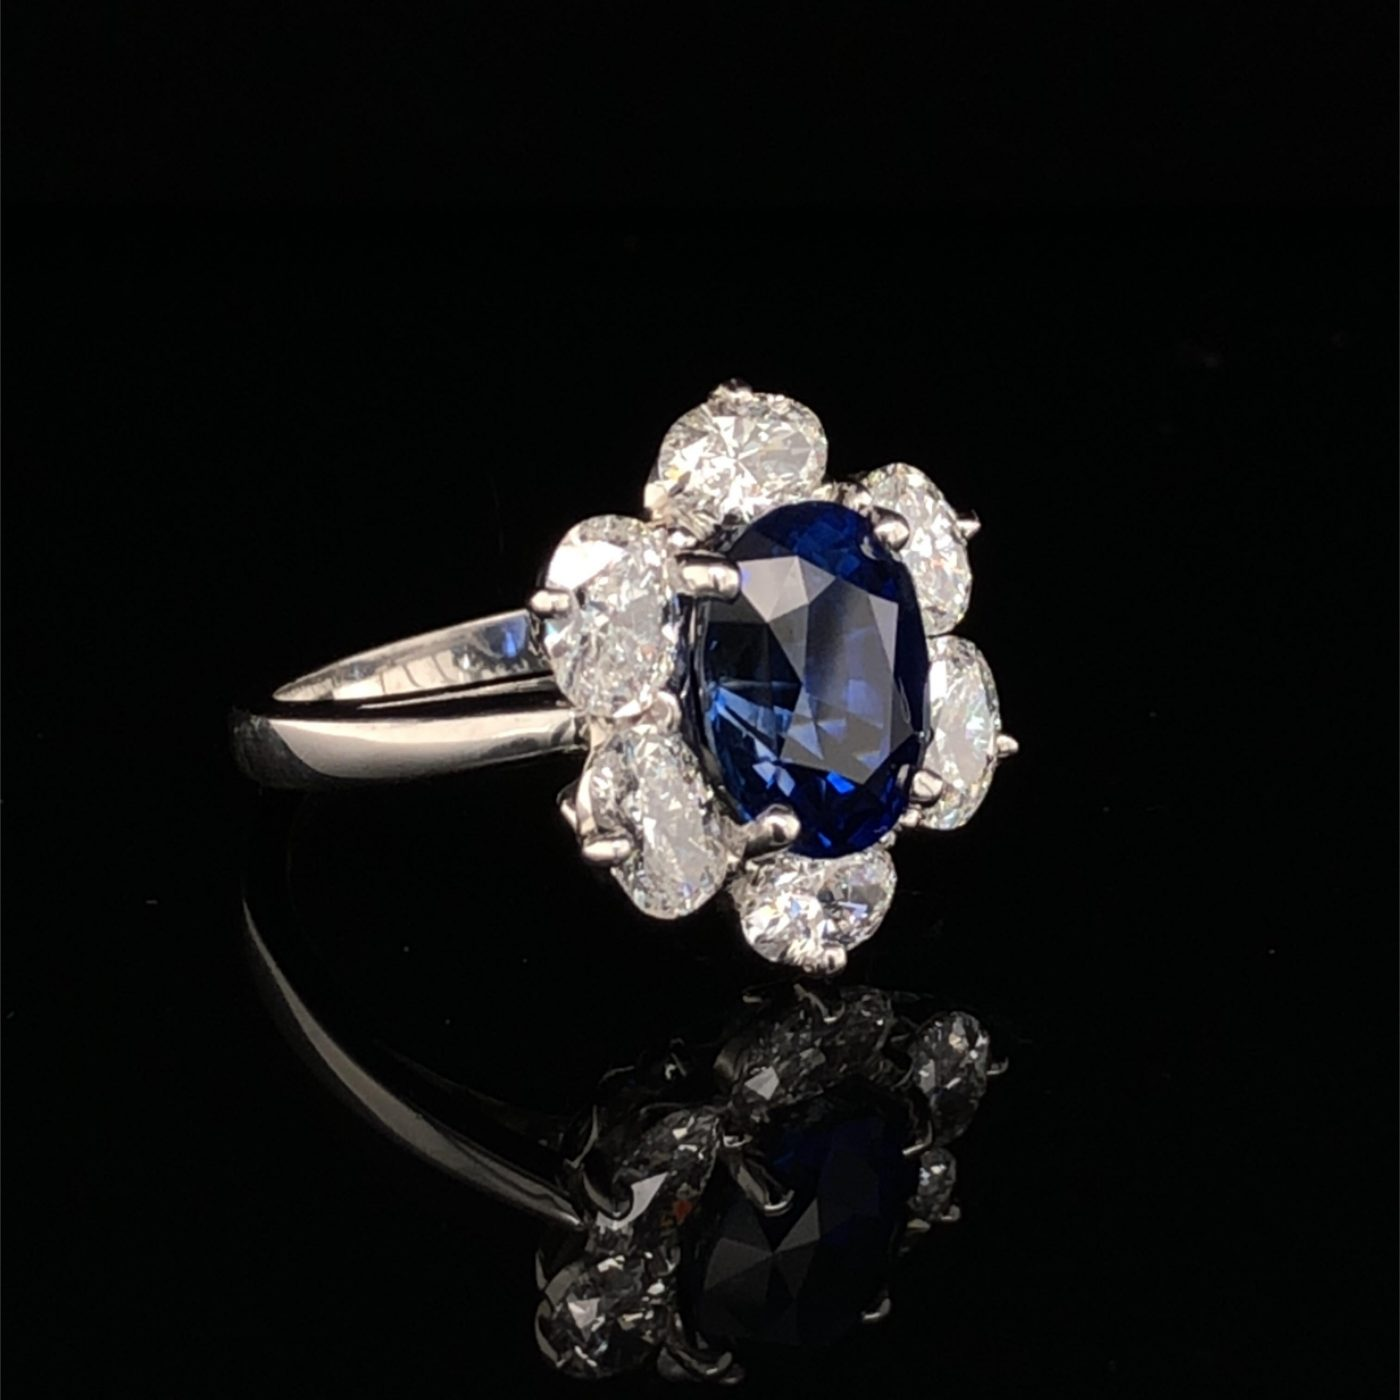 An Oscar Heyman Platinum 4.04ct Royal Blue Sapphire Entourage Ring